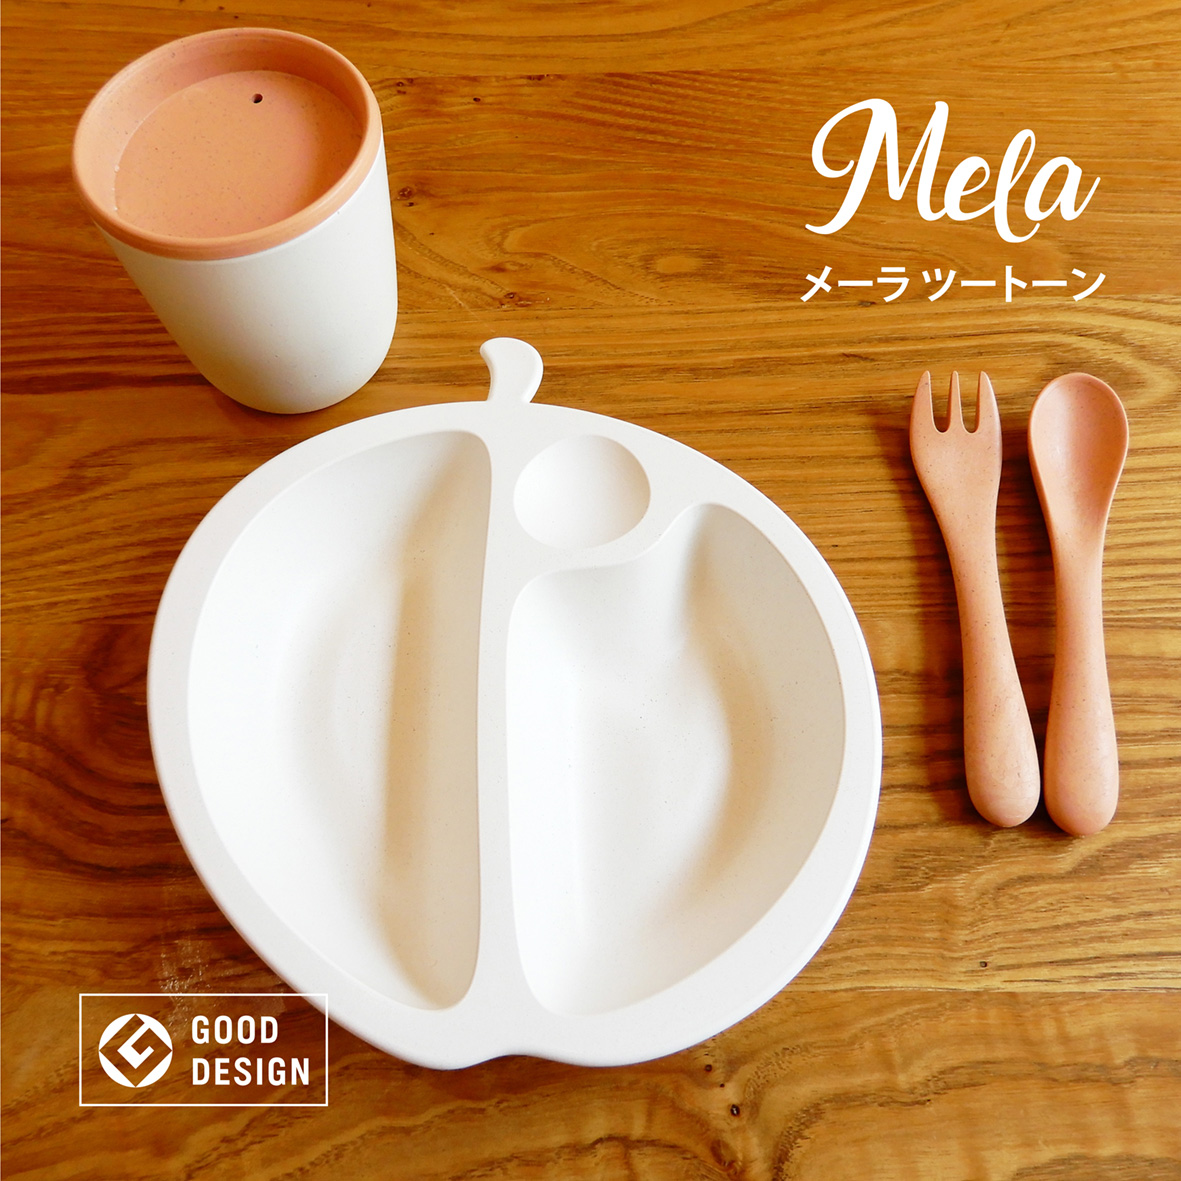 PAPPAシリーズ Mela 2-tone(メーラ)